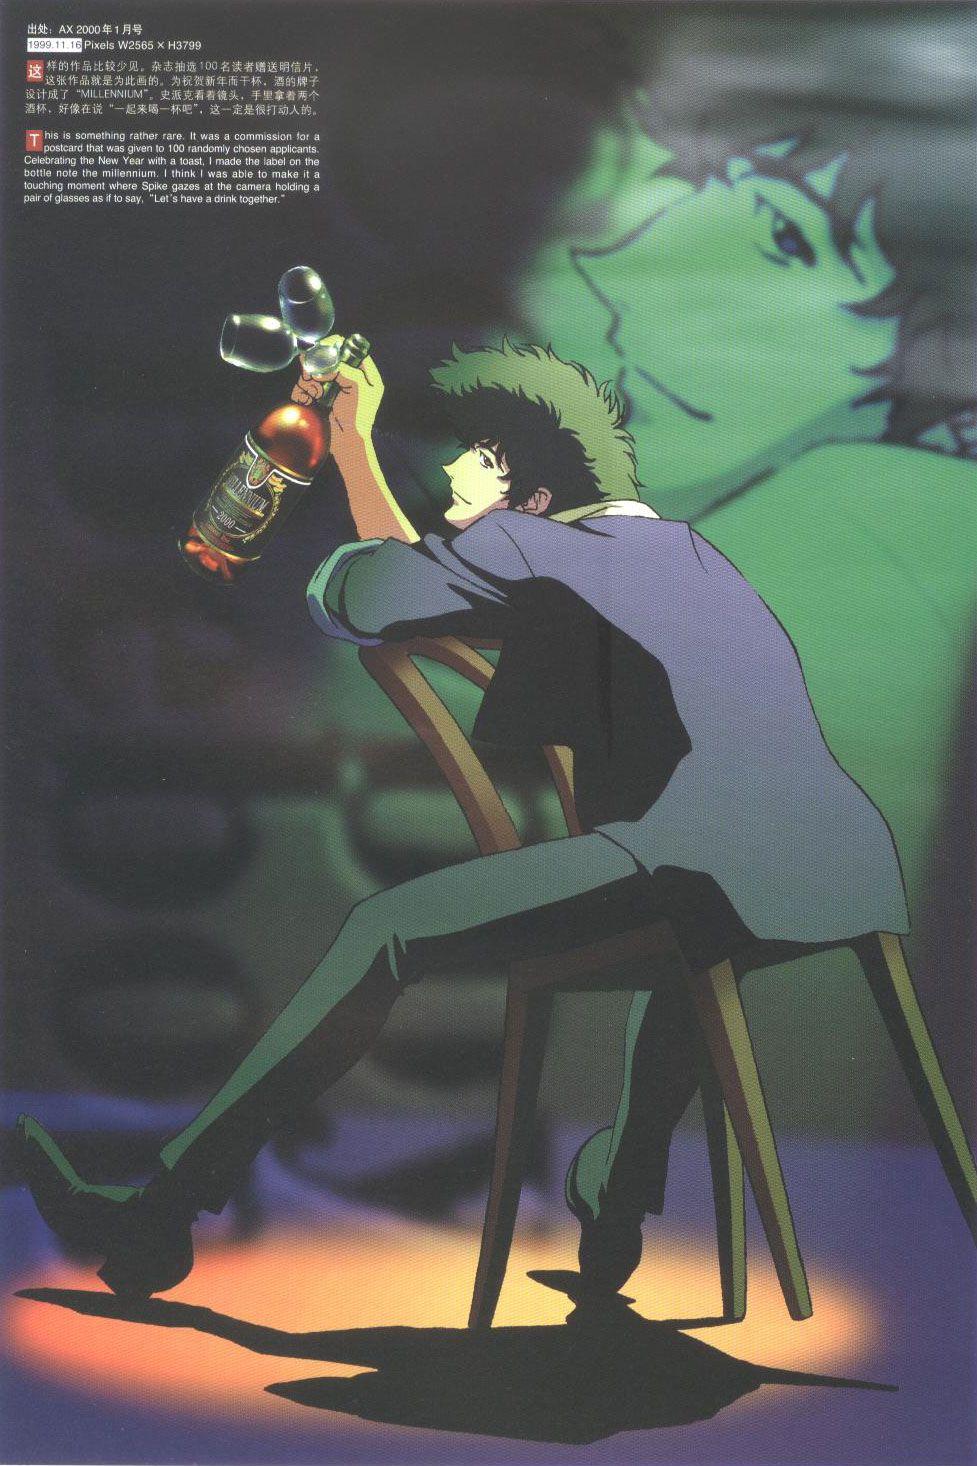 Pin by Jason Kamerath on Anime Cowboy bebop, Cowboy